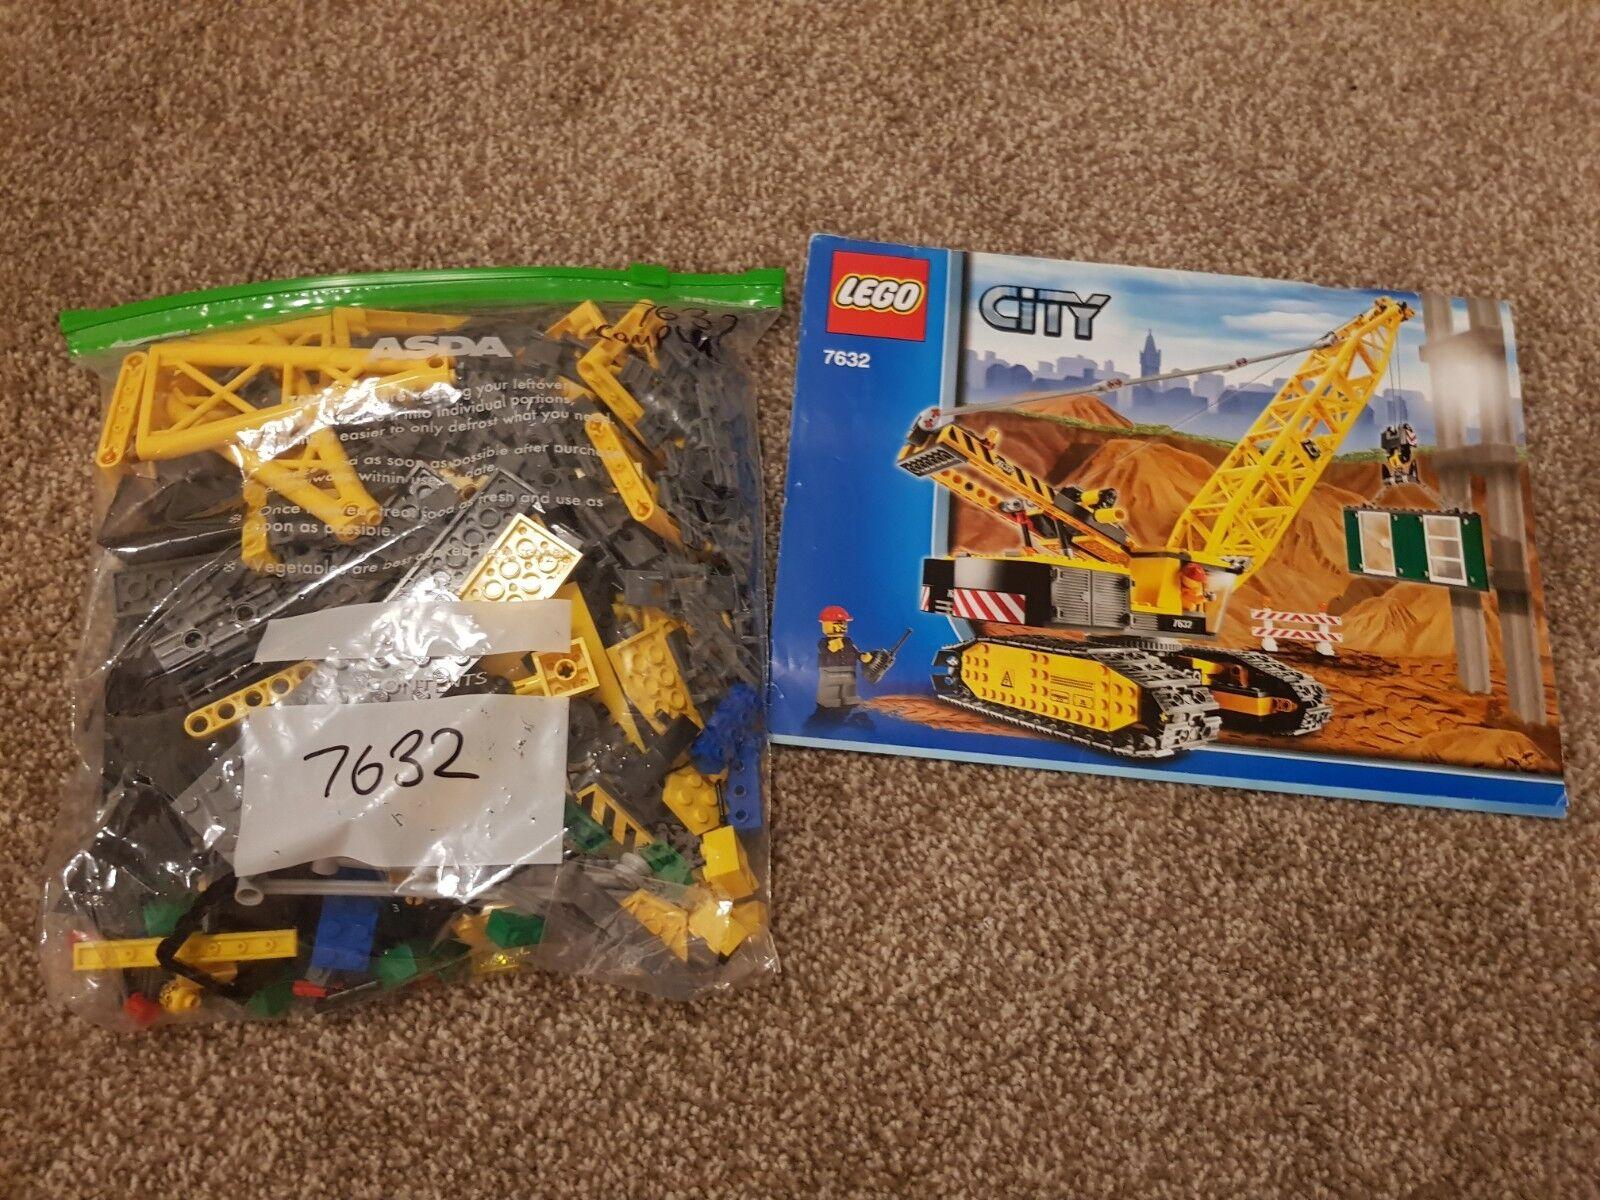 LEGO City 7632 Crawler Crawler Crawler Crane Complete Town Construction Worker fbbc4f